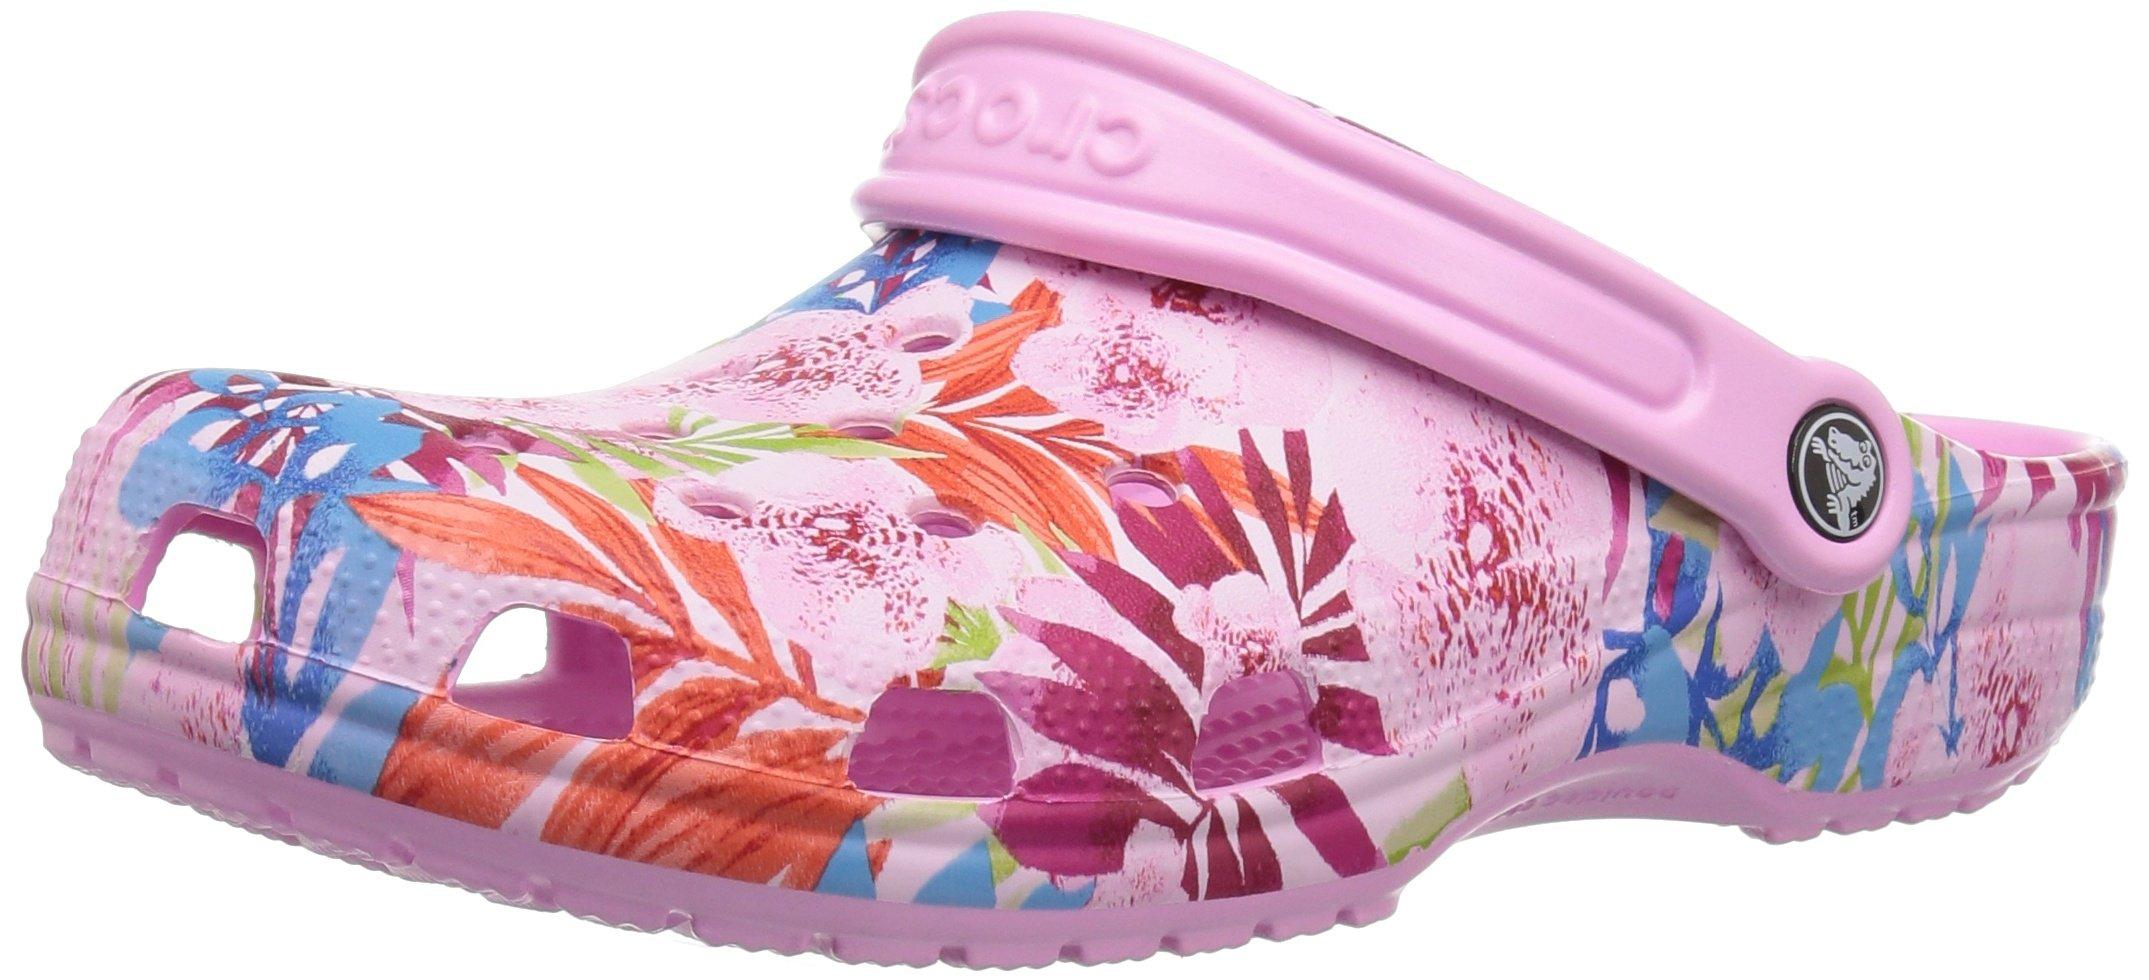 Crocs Unisex Classic Printed Clog Mule, Carnation/Candy Pink, 6 US Men / 8 US Women